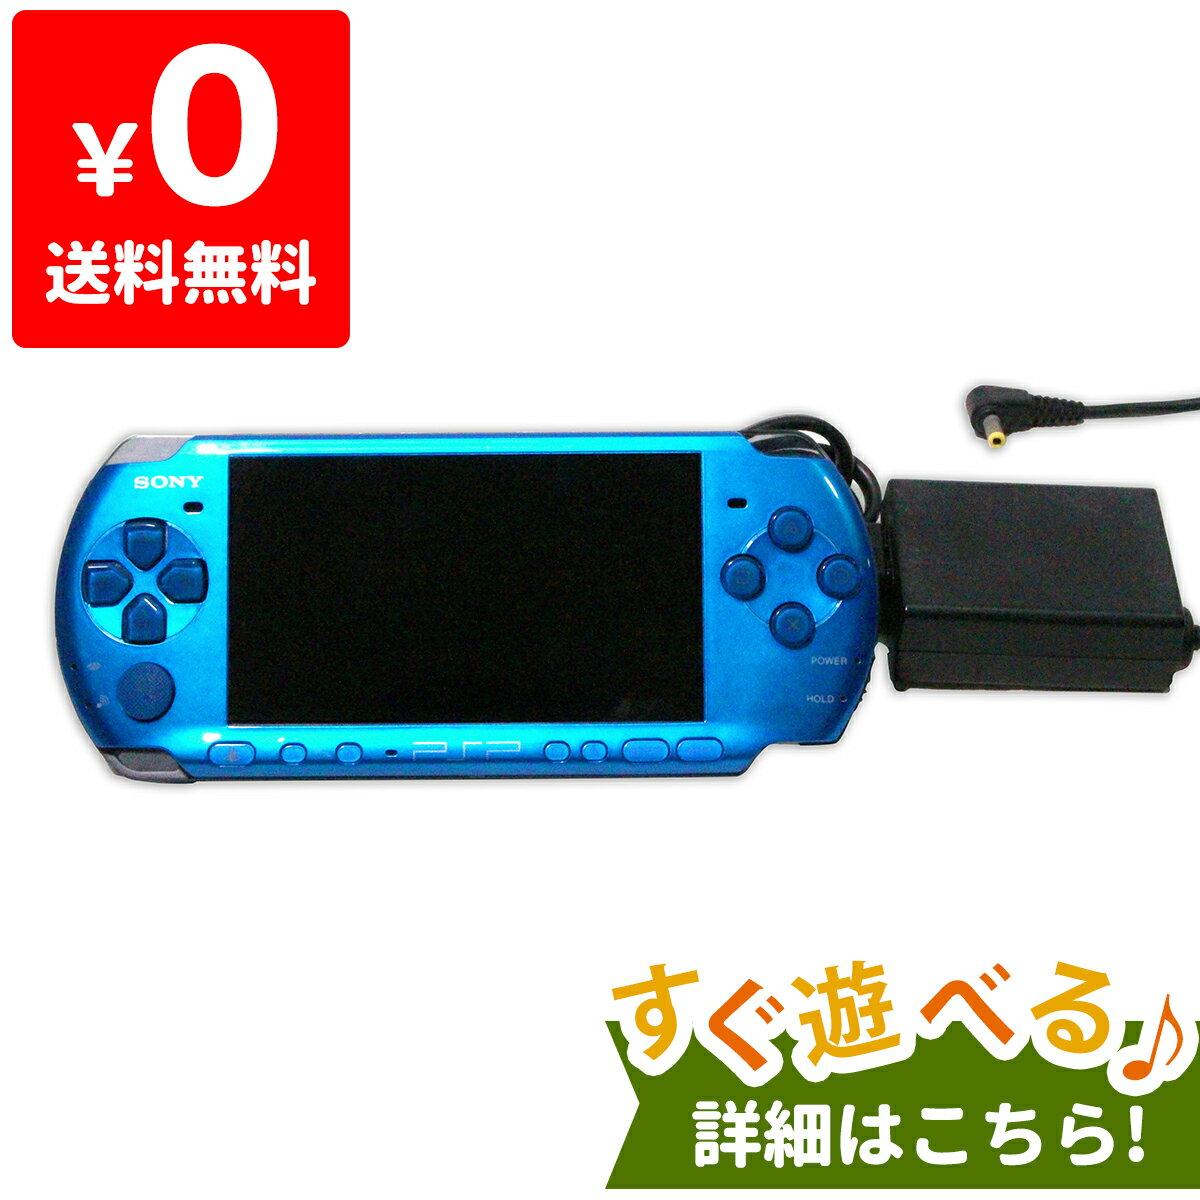 PSP 3000 バイブラント・ブルー (PSP-3000VB) 本体 すぐ遊べるセット PlayStationPortable SONY ソニー 中古 4948872412124 送料無料 【中古】